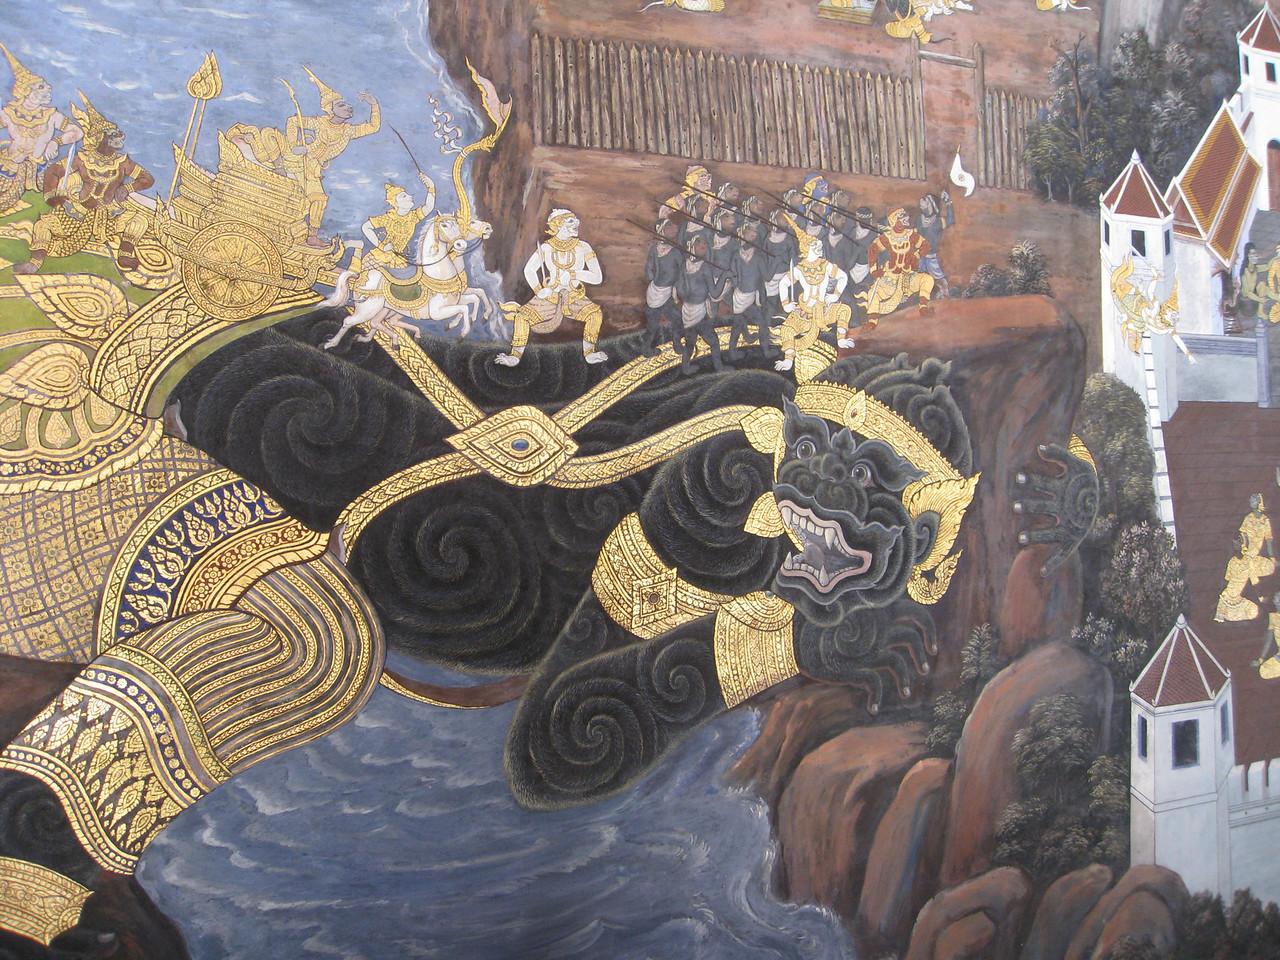 Scene from the Ramakien (รามเกียรติ์)